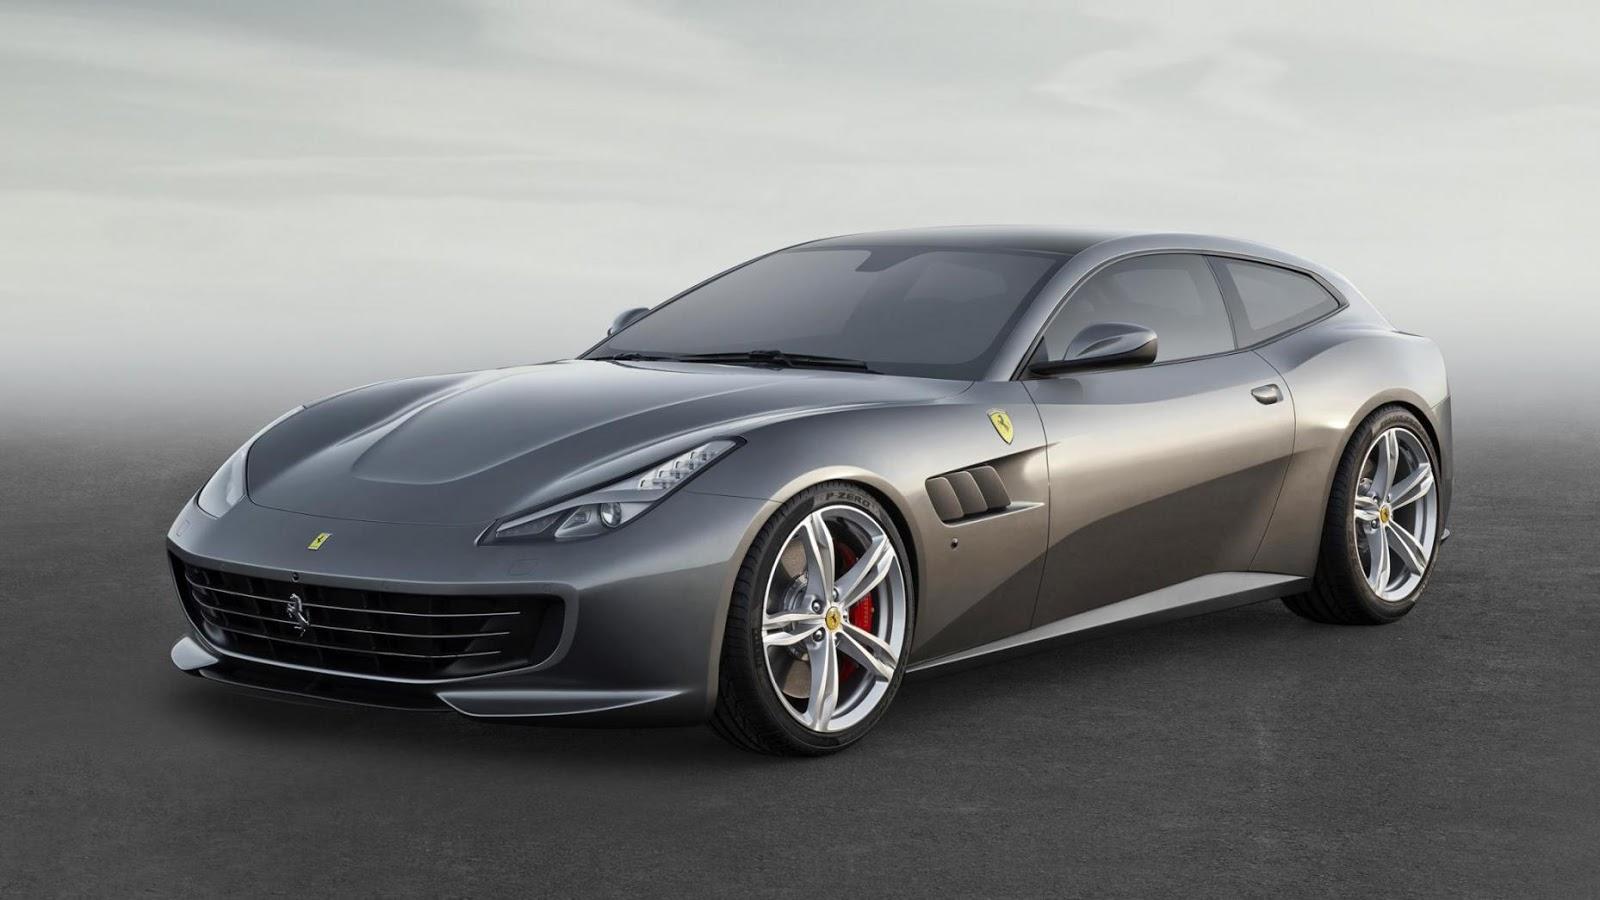 Ferrari GTC4 Lusso 3,4 giây